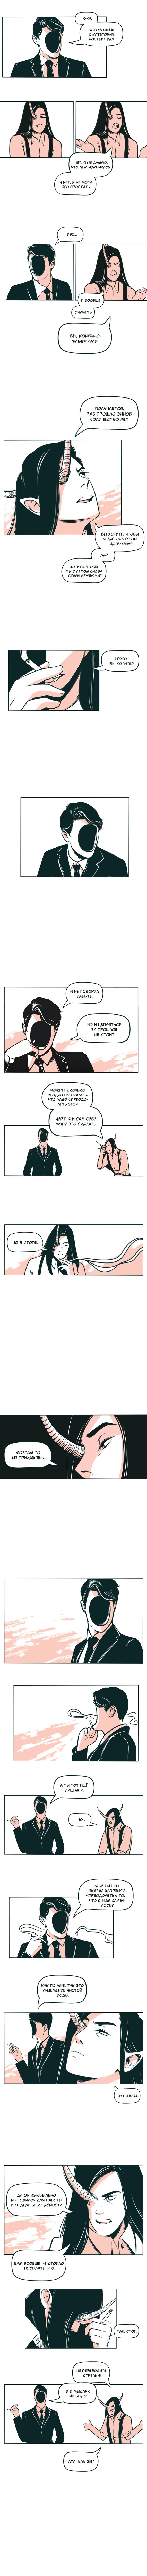 https://r1.ninemanga.com/comics/pic2/0/33536/426157/1534978596391.jpg Page 3